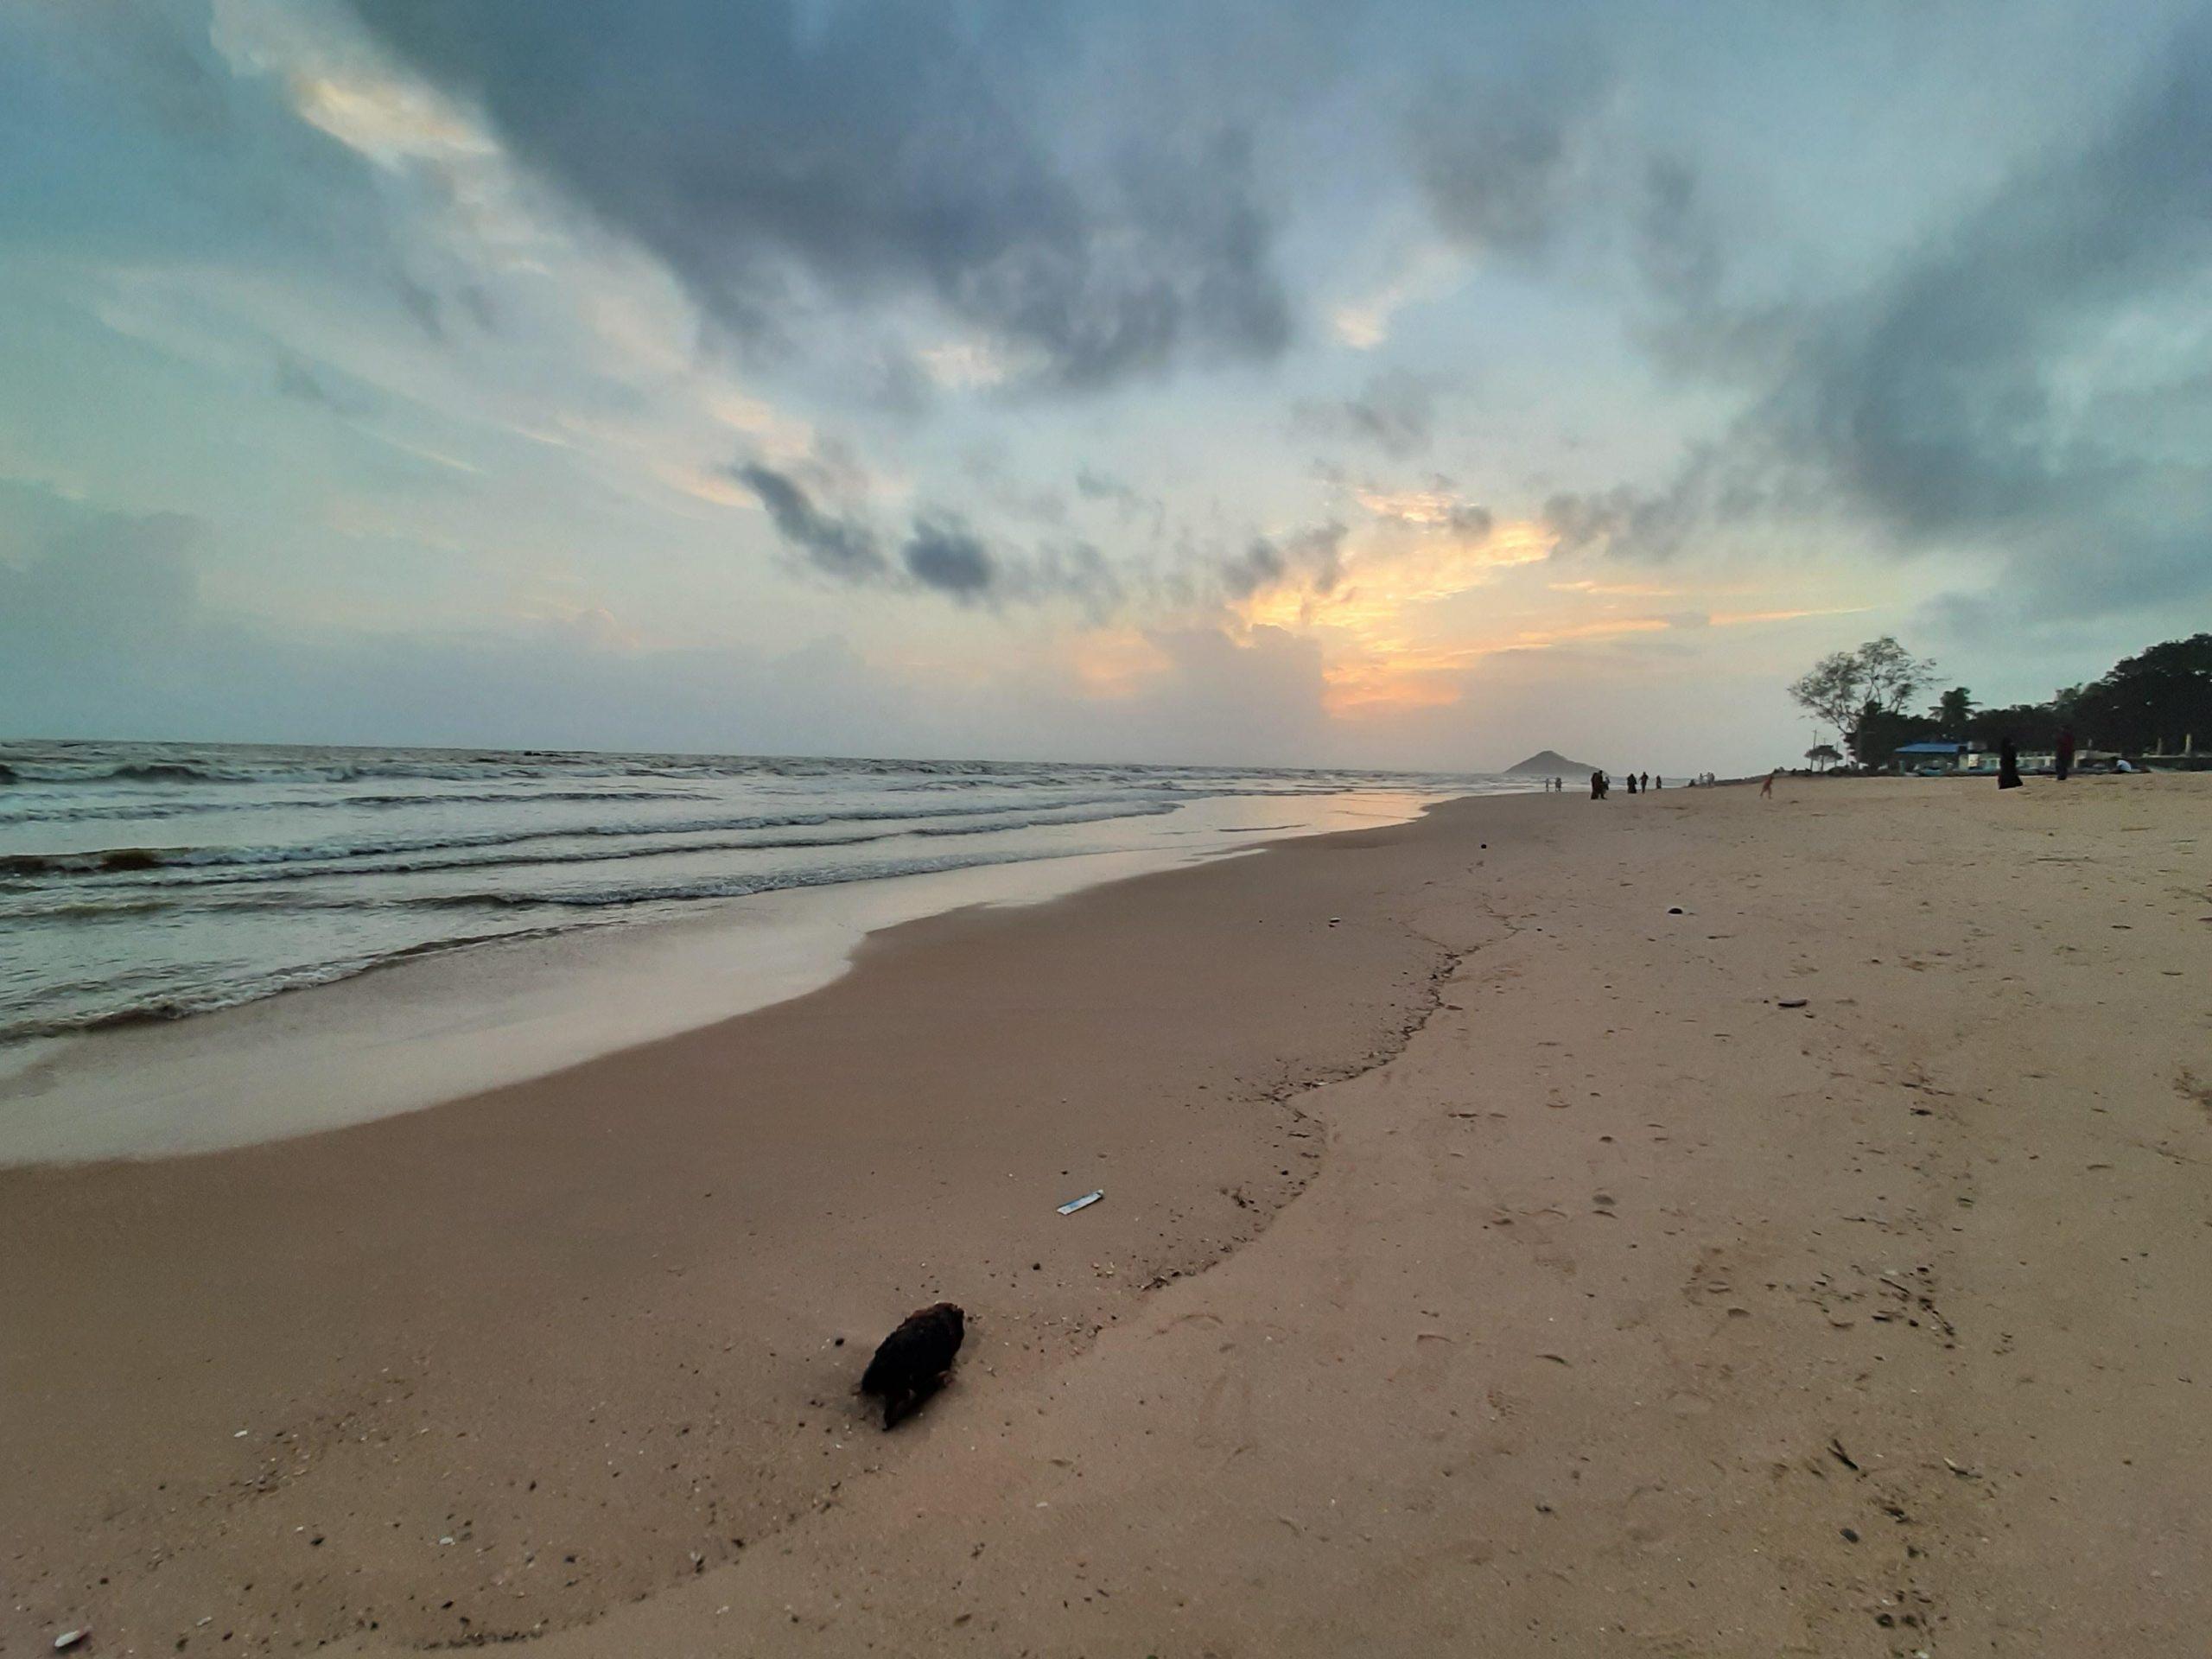 Jali Beach in Bhatkal, Karnataka